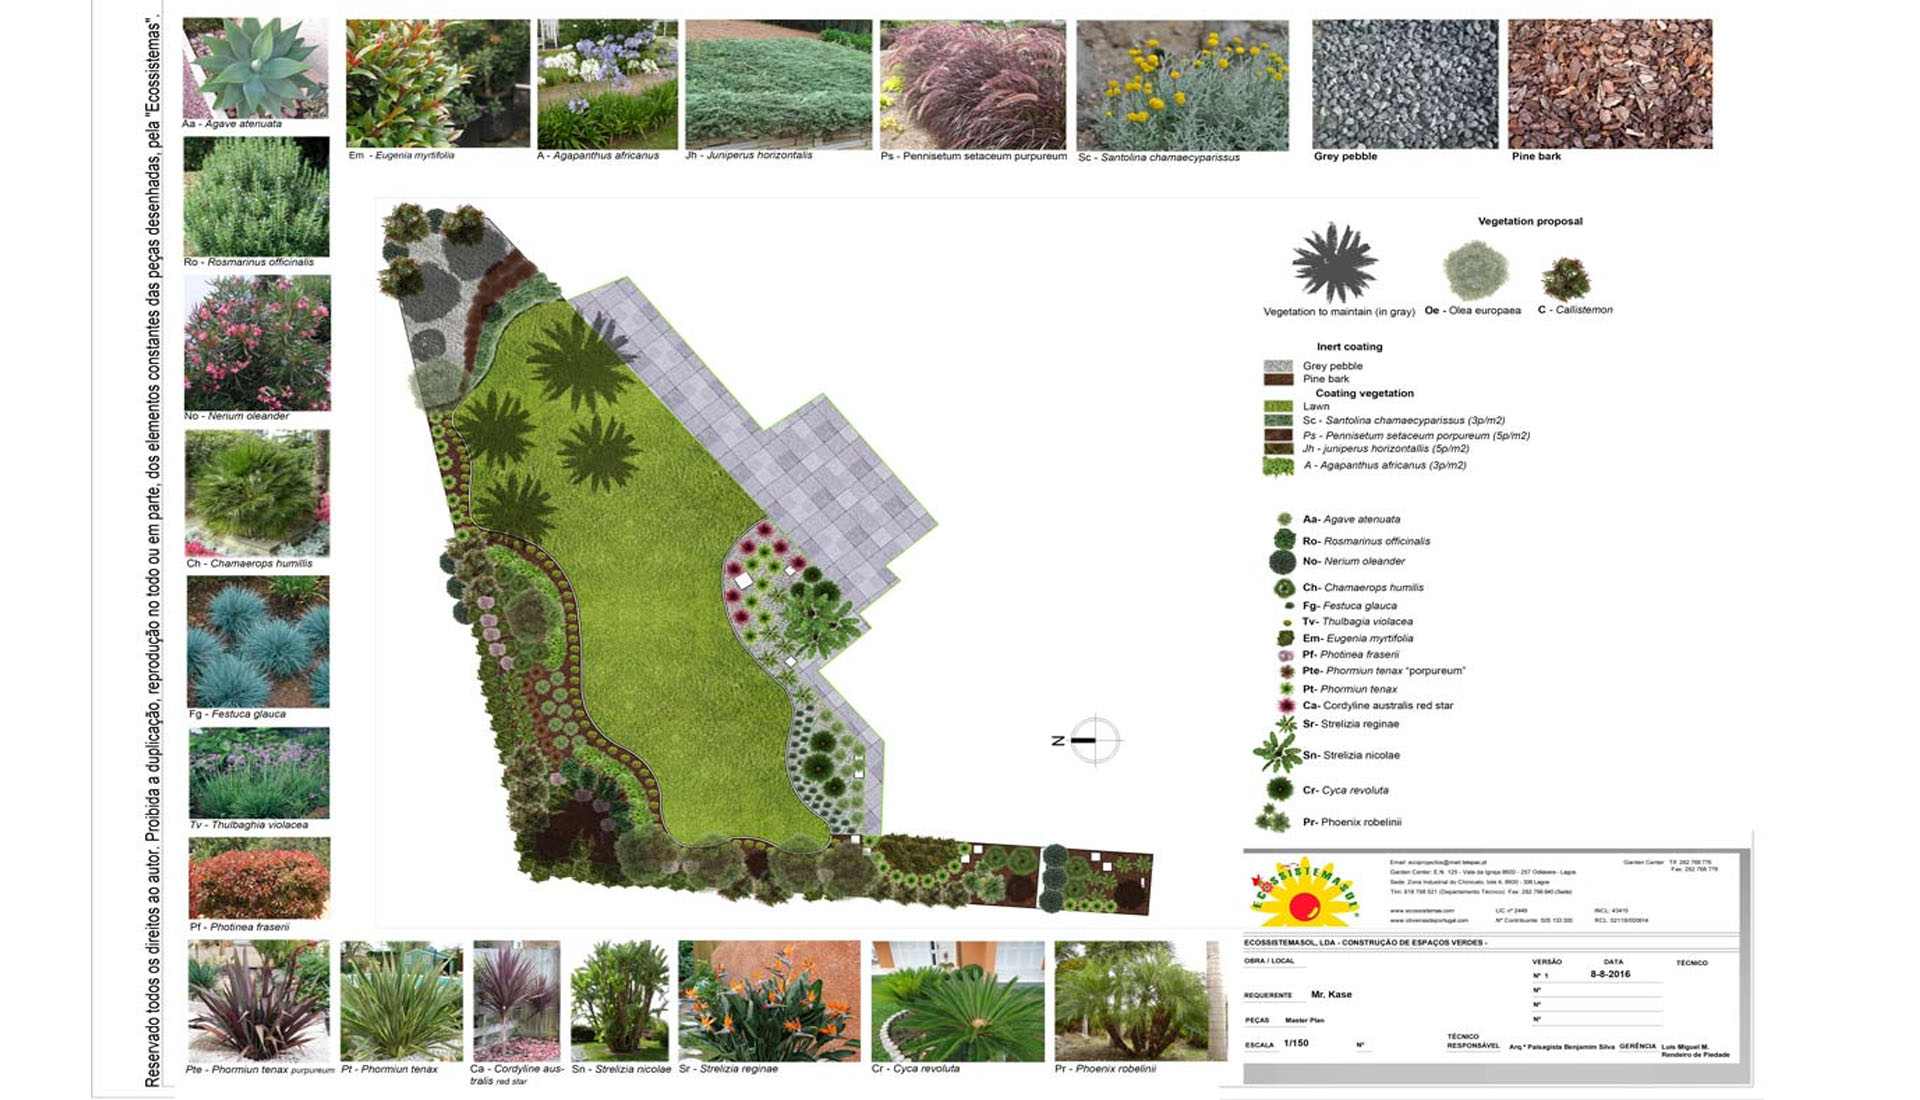 https://ecossistemas.com/storage/2020/12/arq-paisagistica.jpg